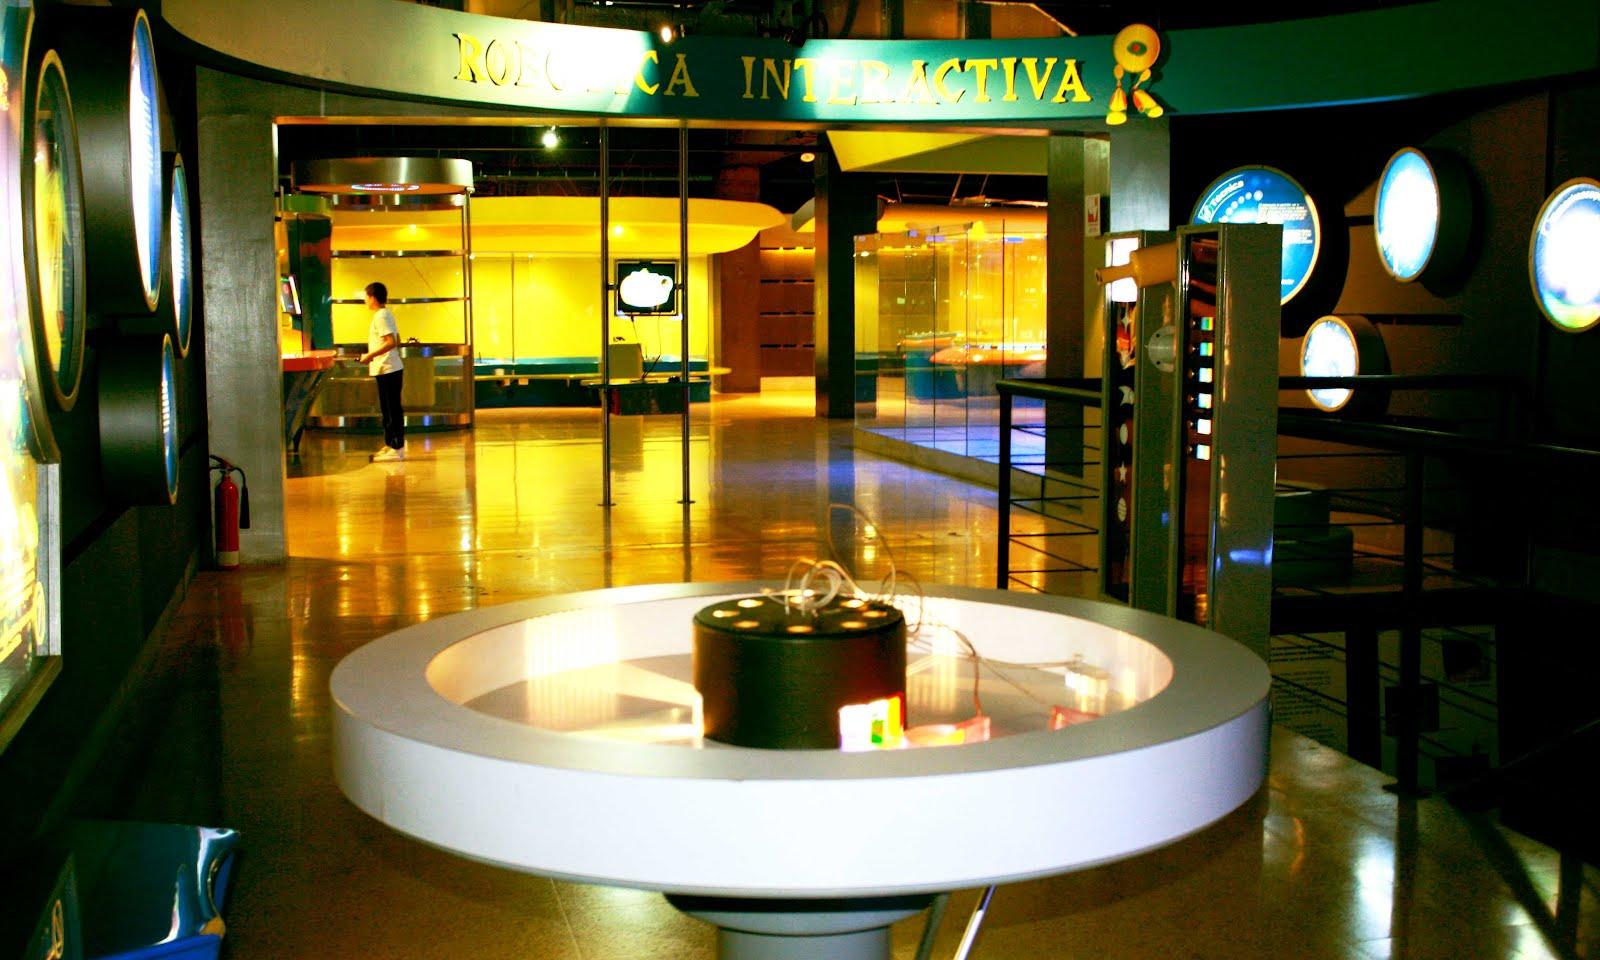 Museos santiago de cali for Abrakadabra salon